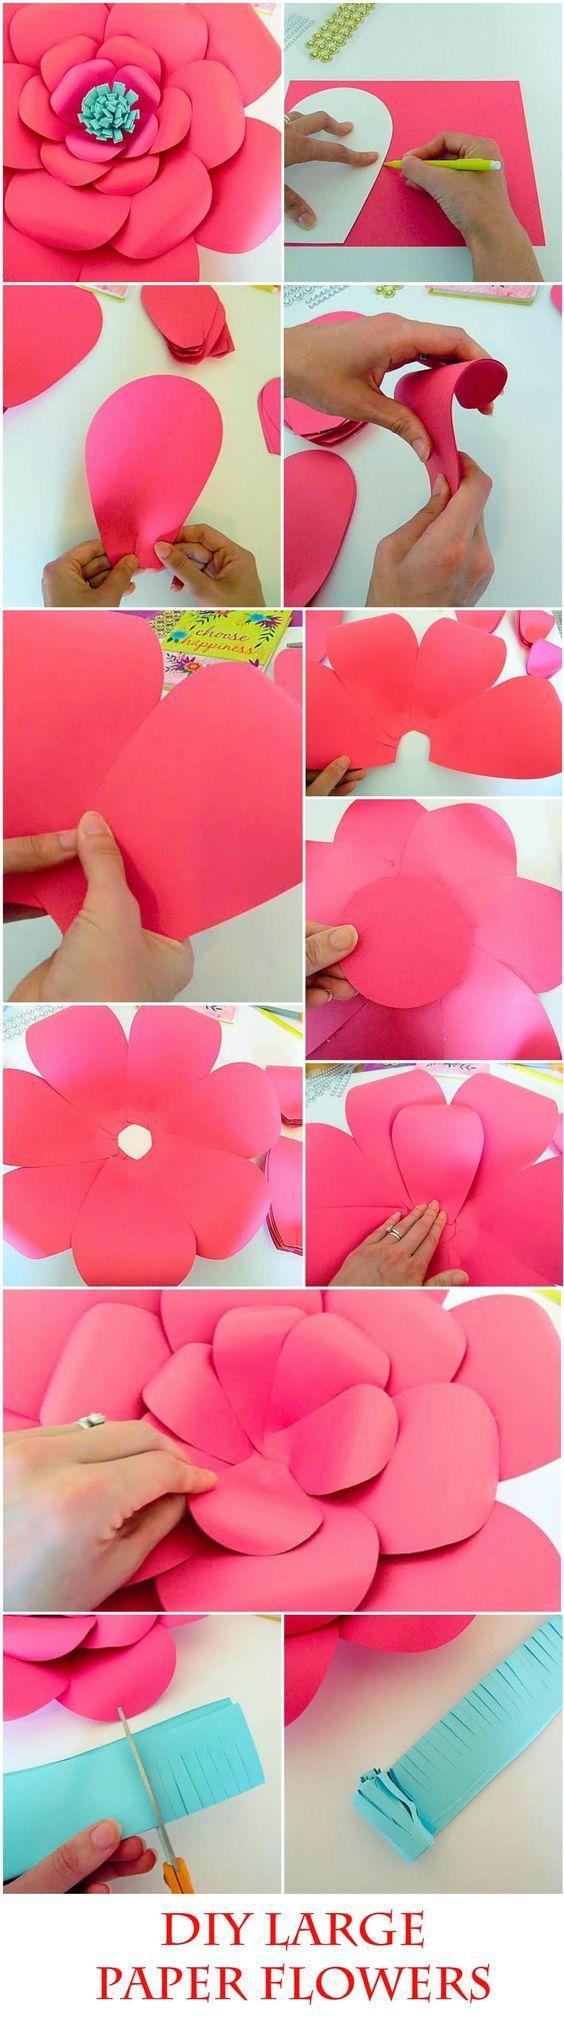 Diy Giant Paper Flower Templates Tutorial Diy Paper Flower Making